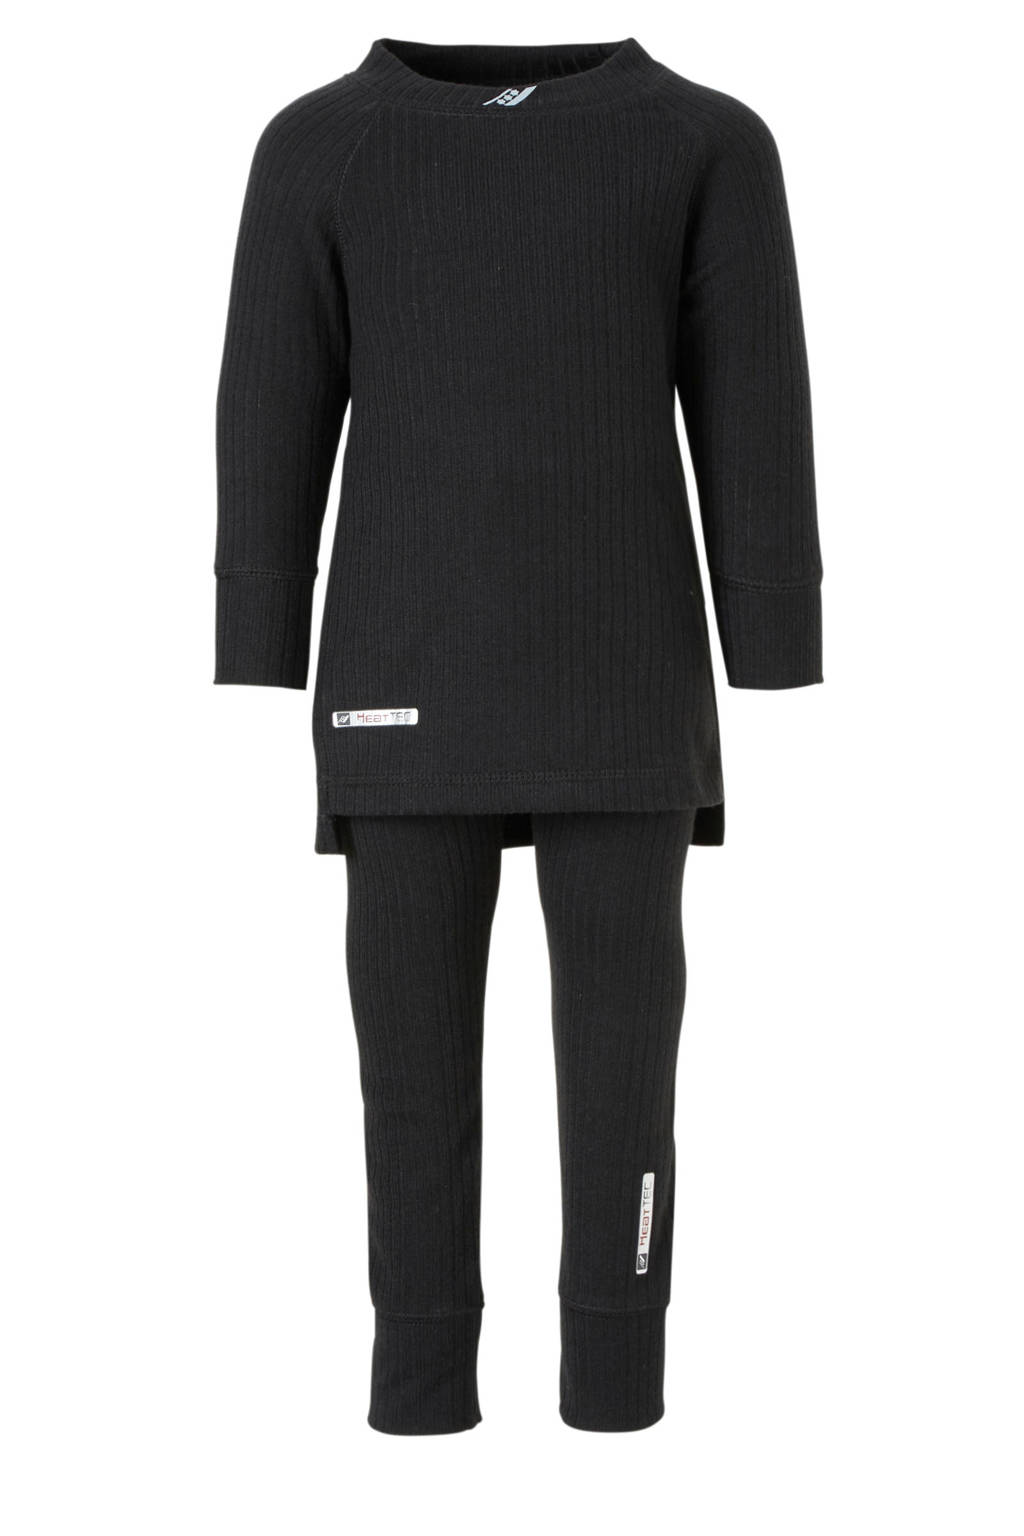 Rucanor thermo shirt+broek zwart, Zwart